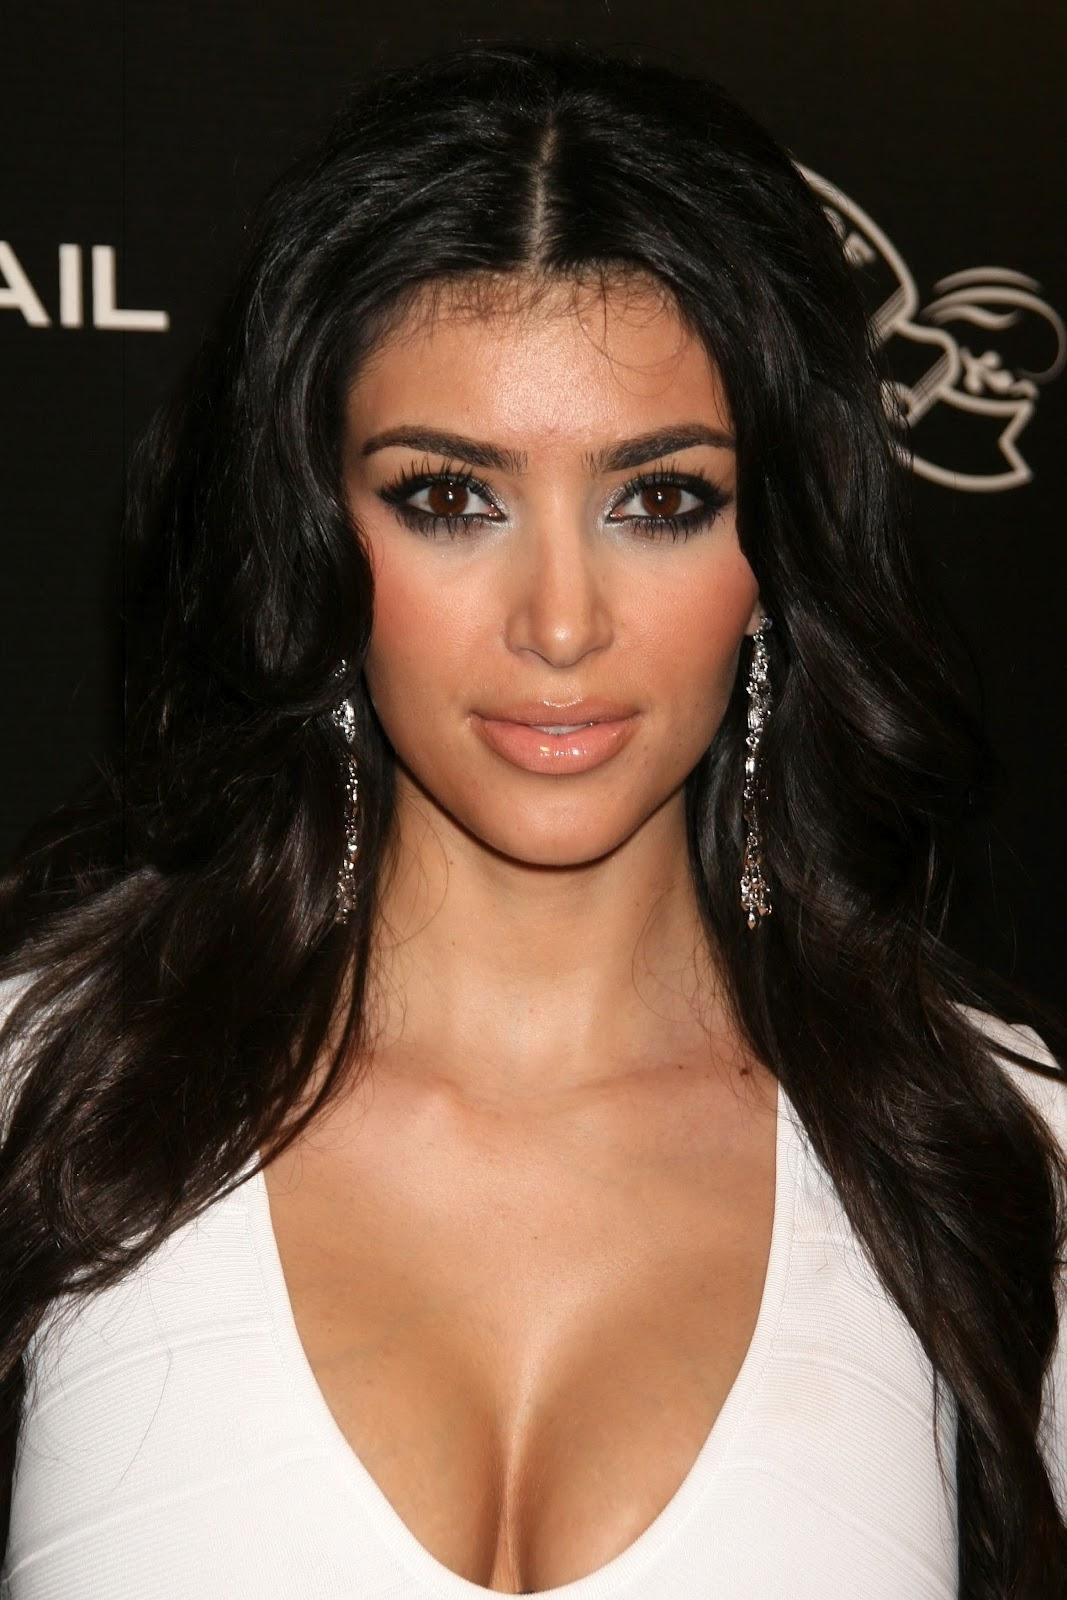 http://3.bp.blogspot.com/-XyHi1yMrnB0/T9FJ717uVwI/AAAAAAAAAsY/ttdobE8IPn0/s1600/Kim+Kardashian+Pictures+7.jpg